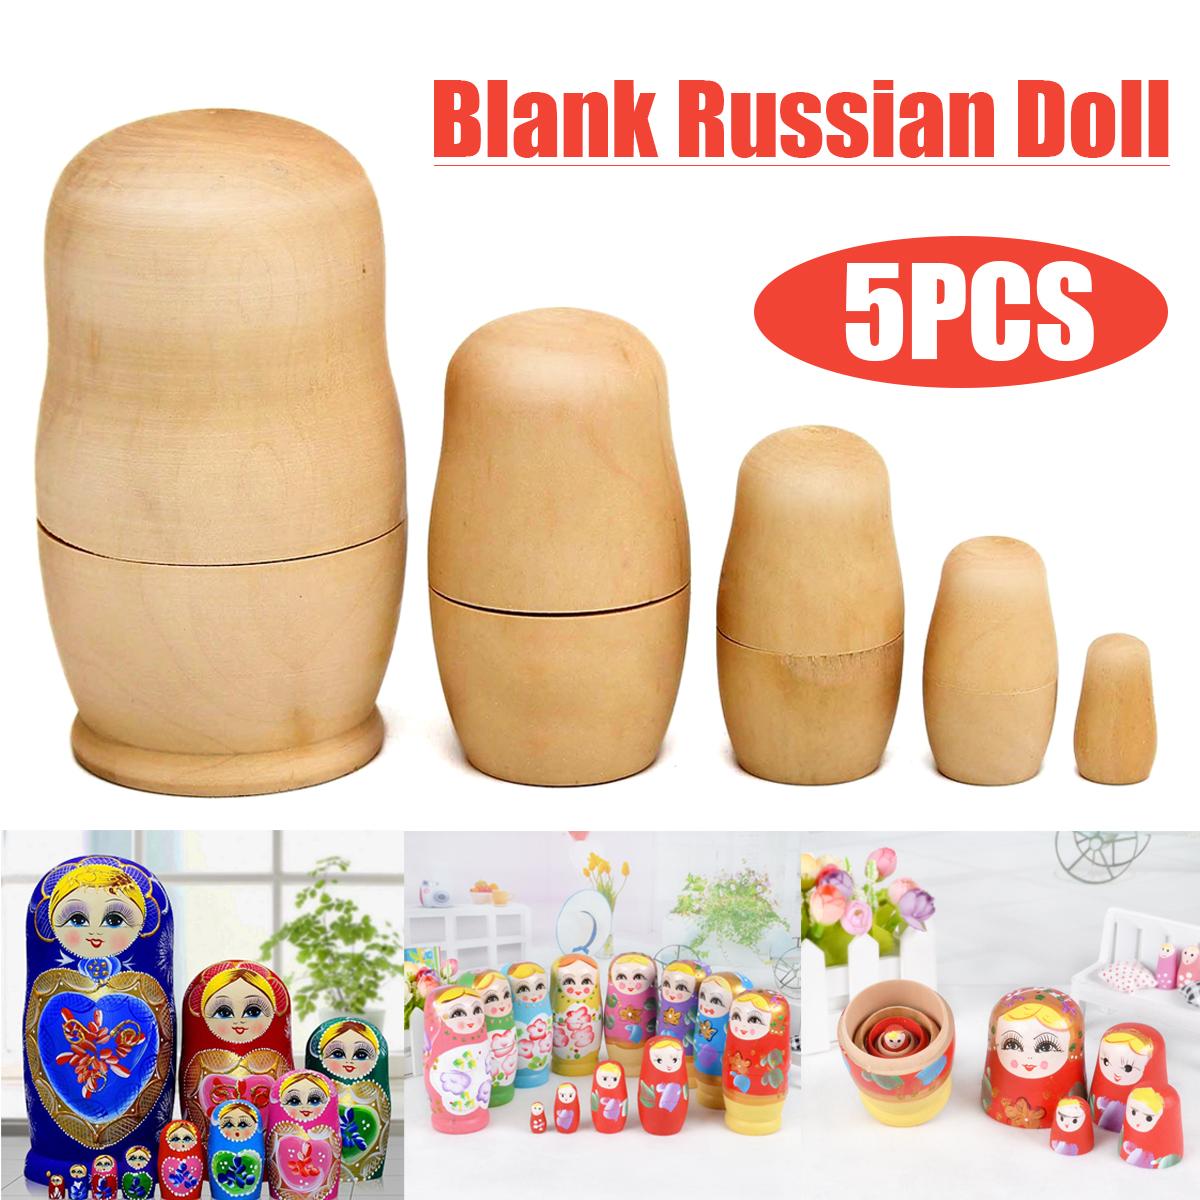 5pcs DIY Unpainted Blank Wooden Embryo Russian Nesting ...